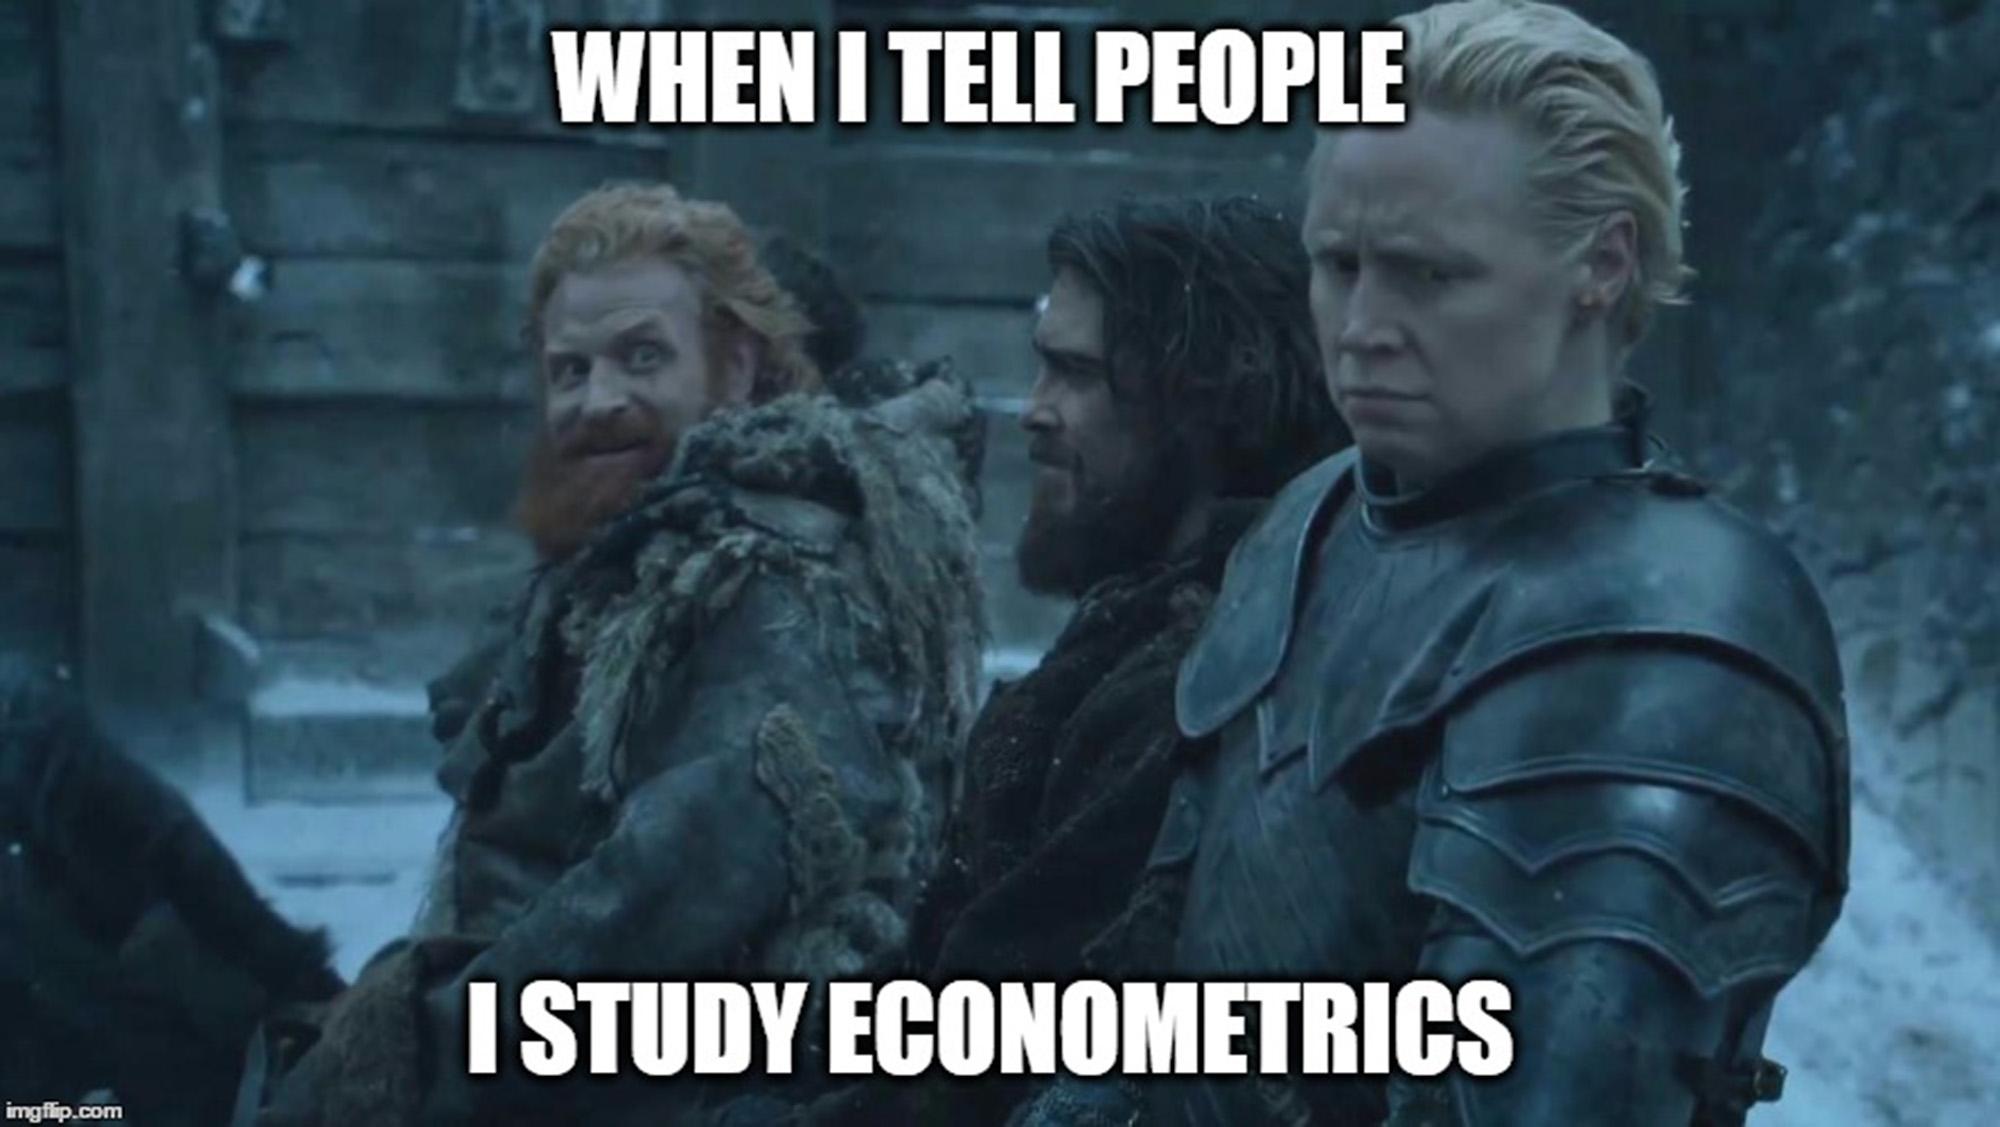 When I tell people I study econometrics